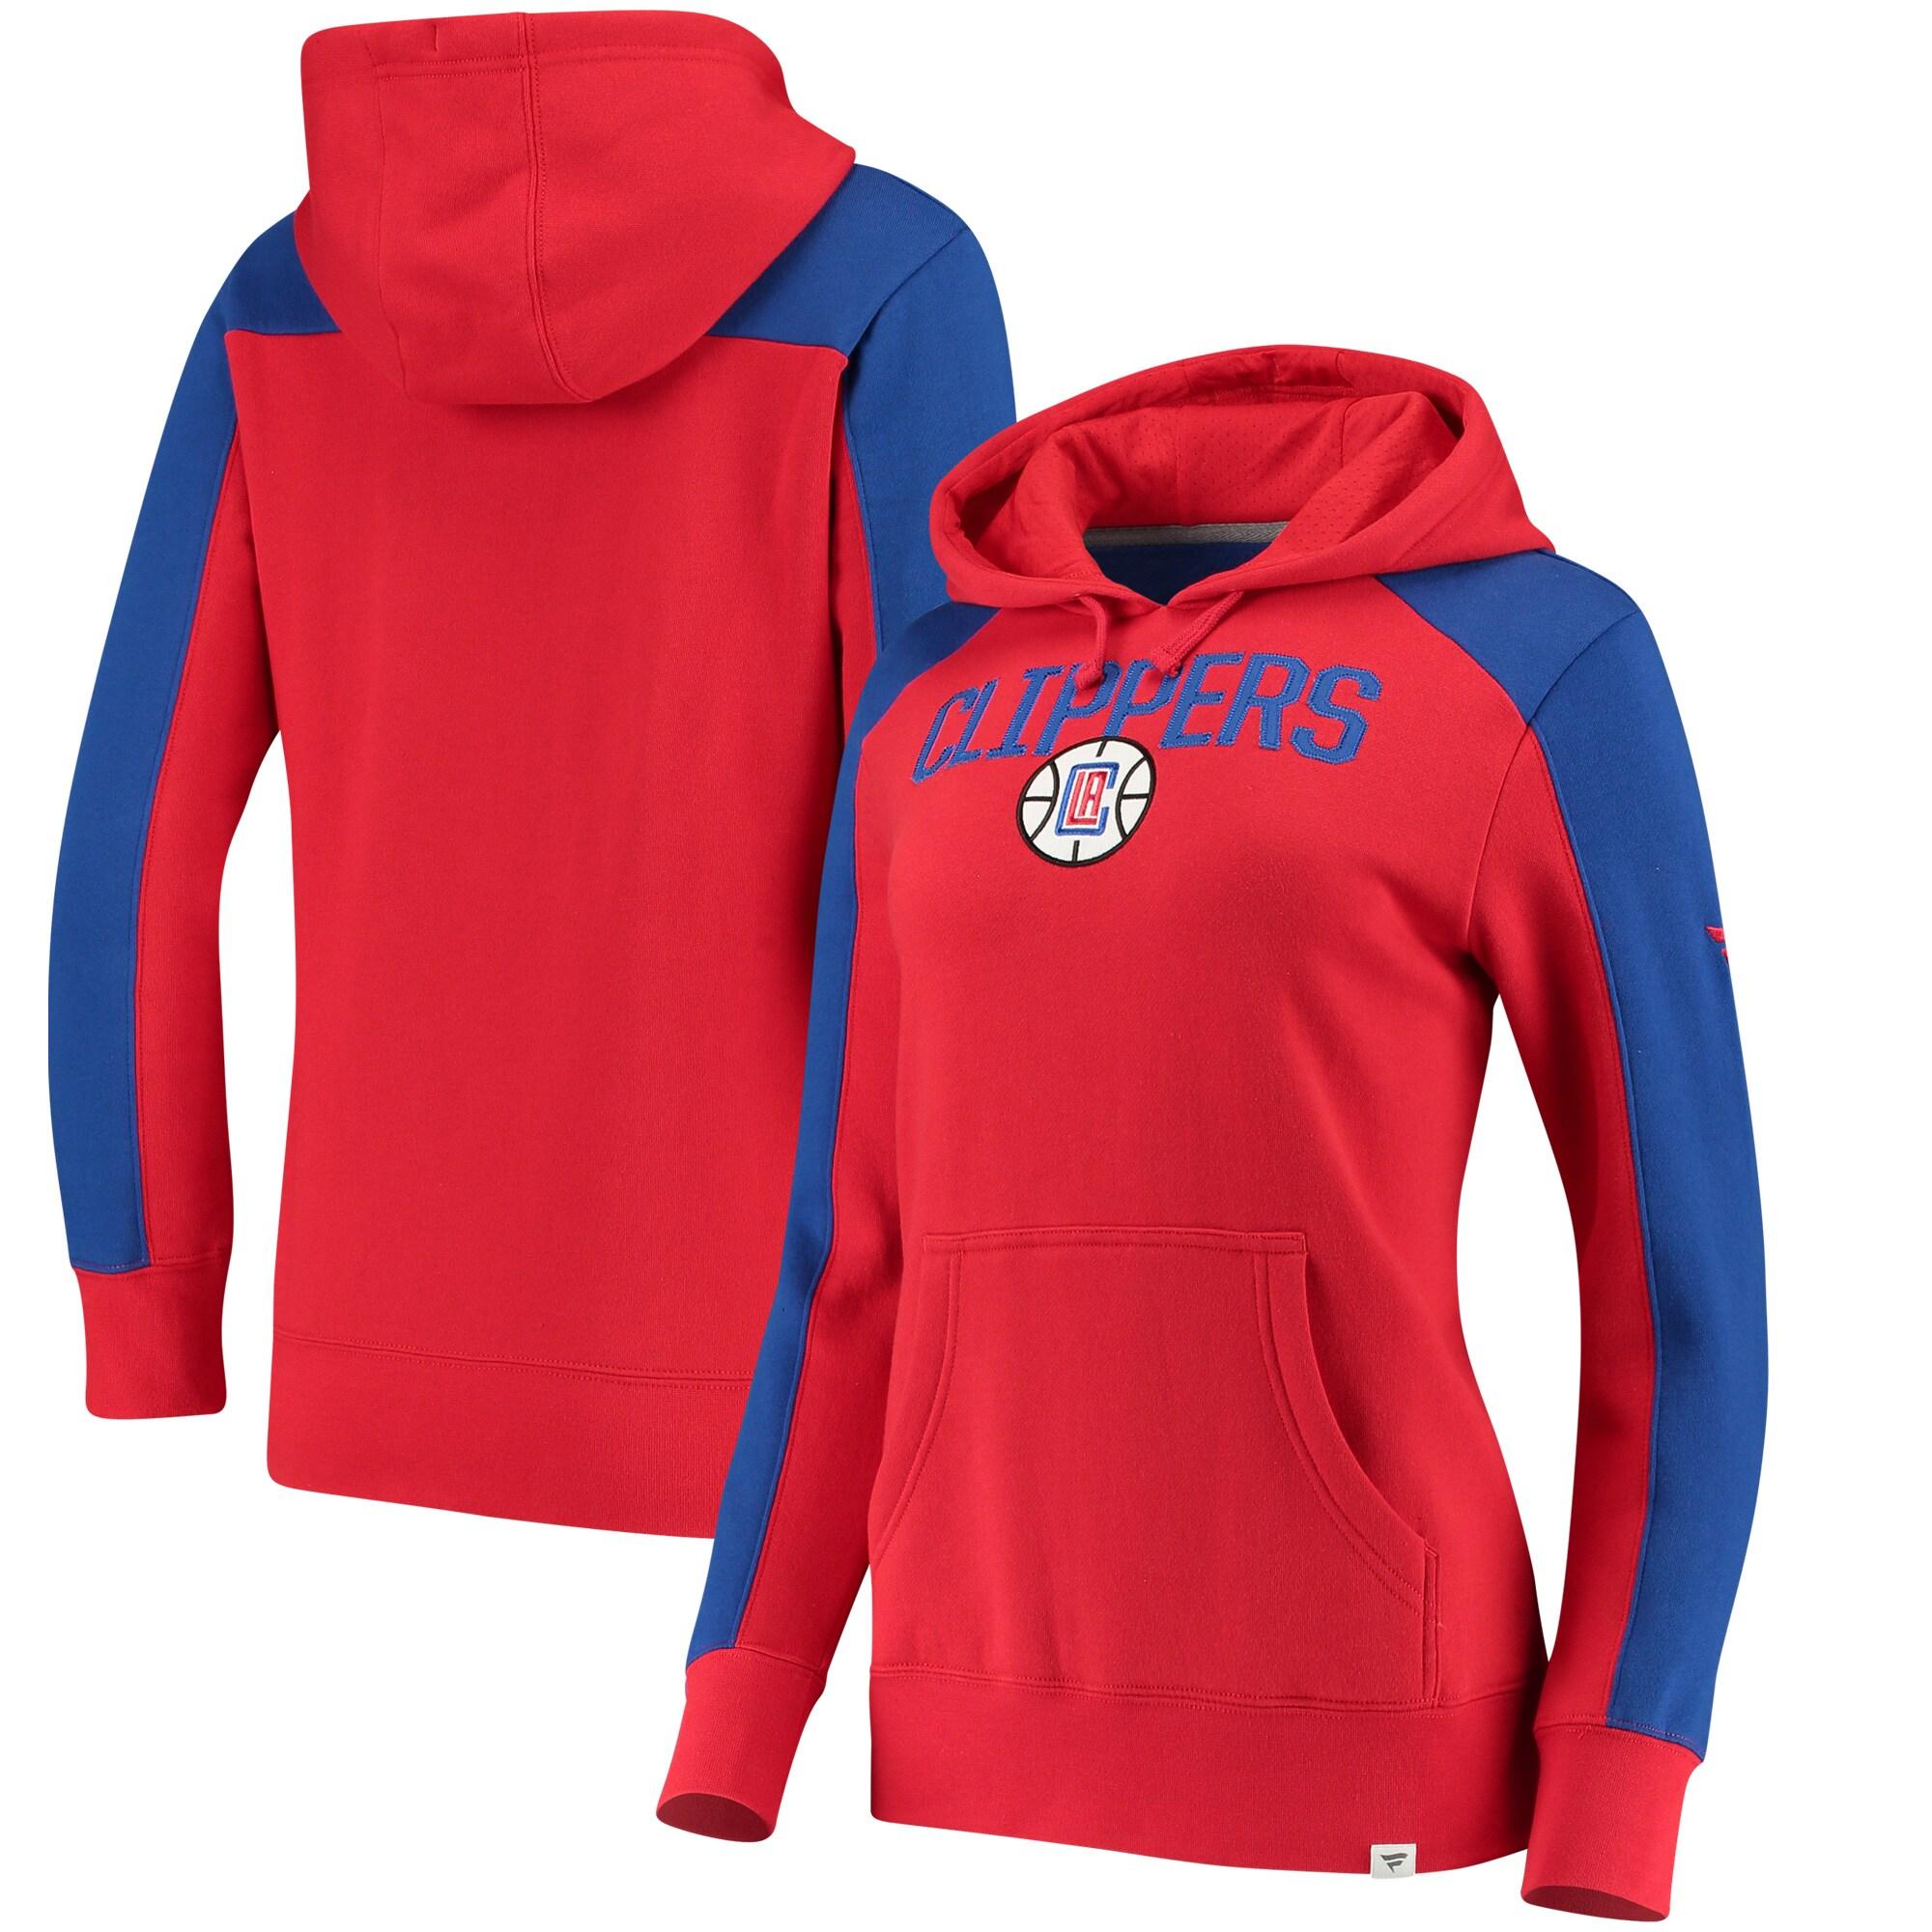 LA Clippers Fanatics Branded Women's Iconic Fleece Hoodie - Red/Royal